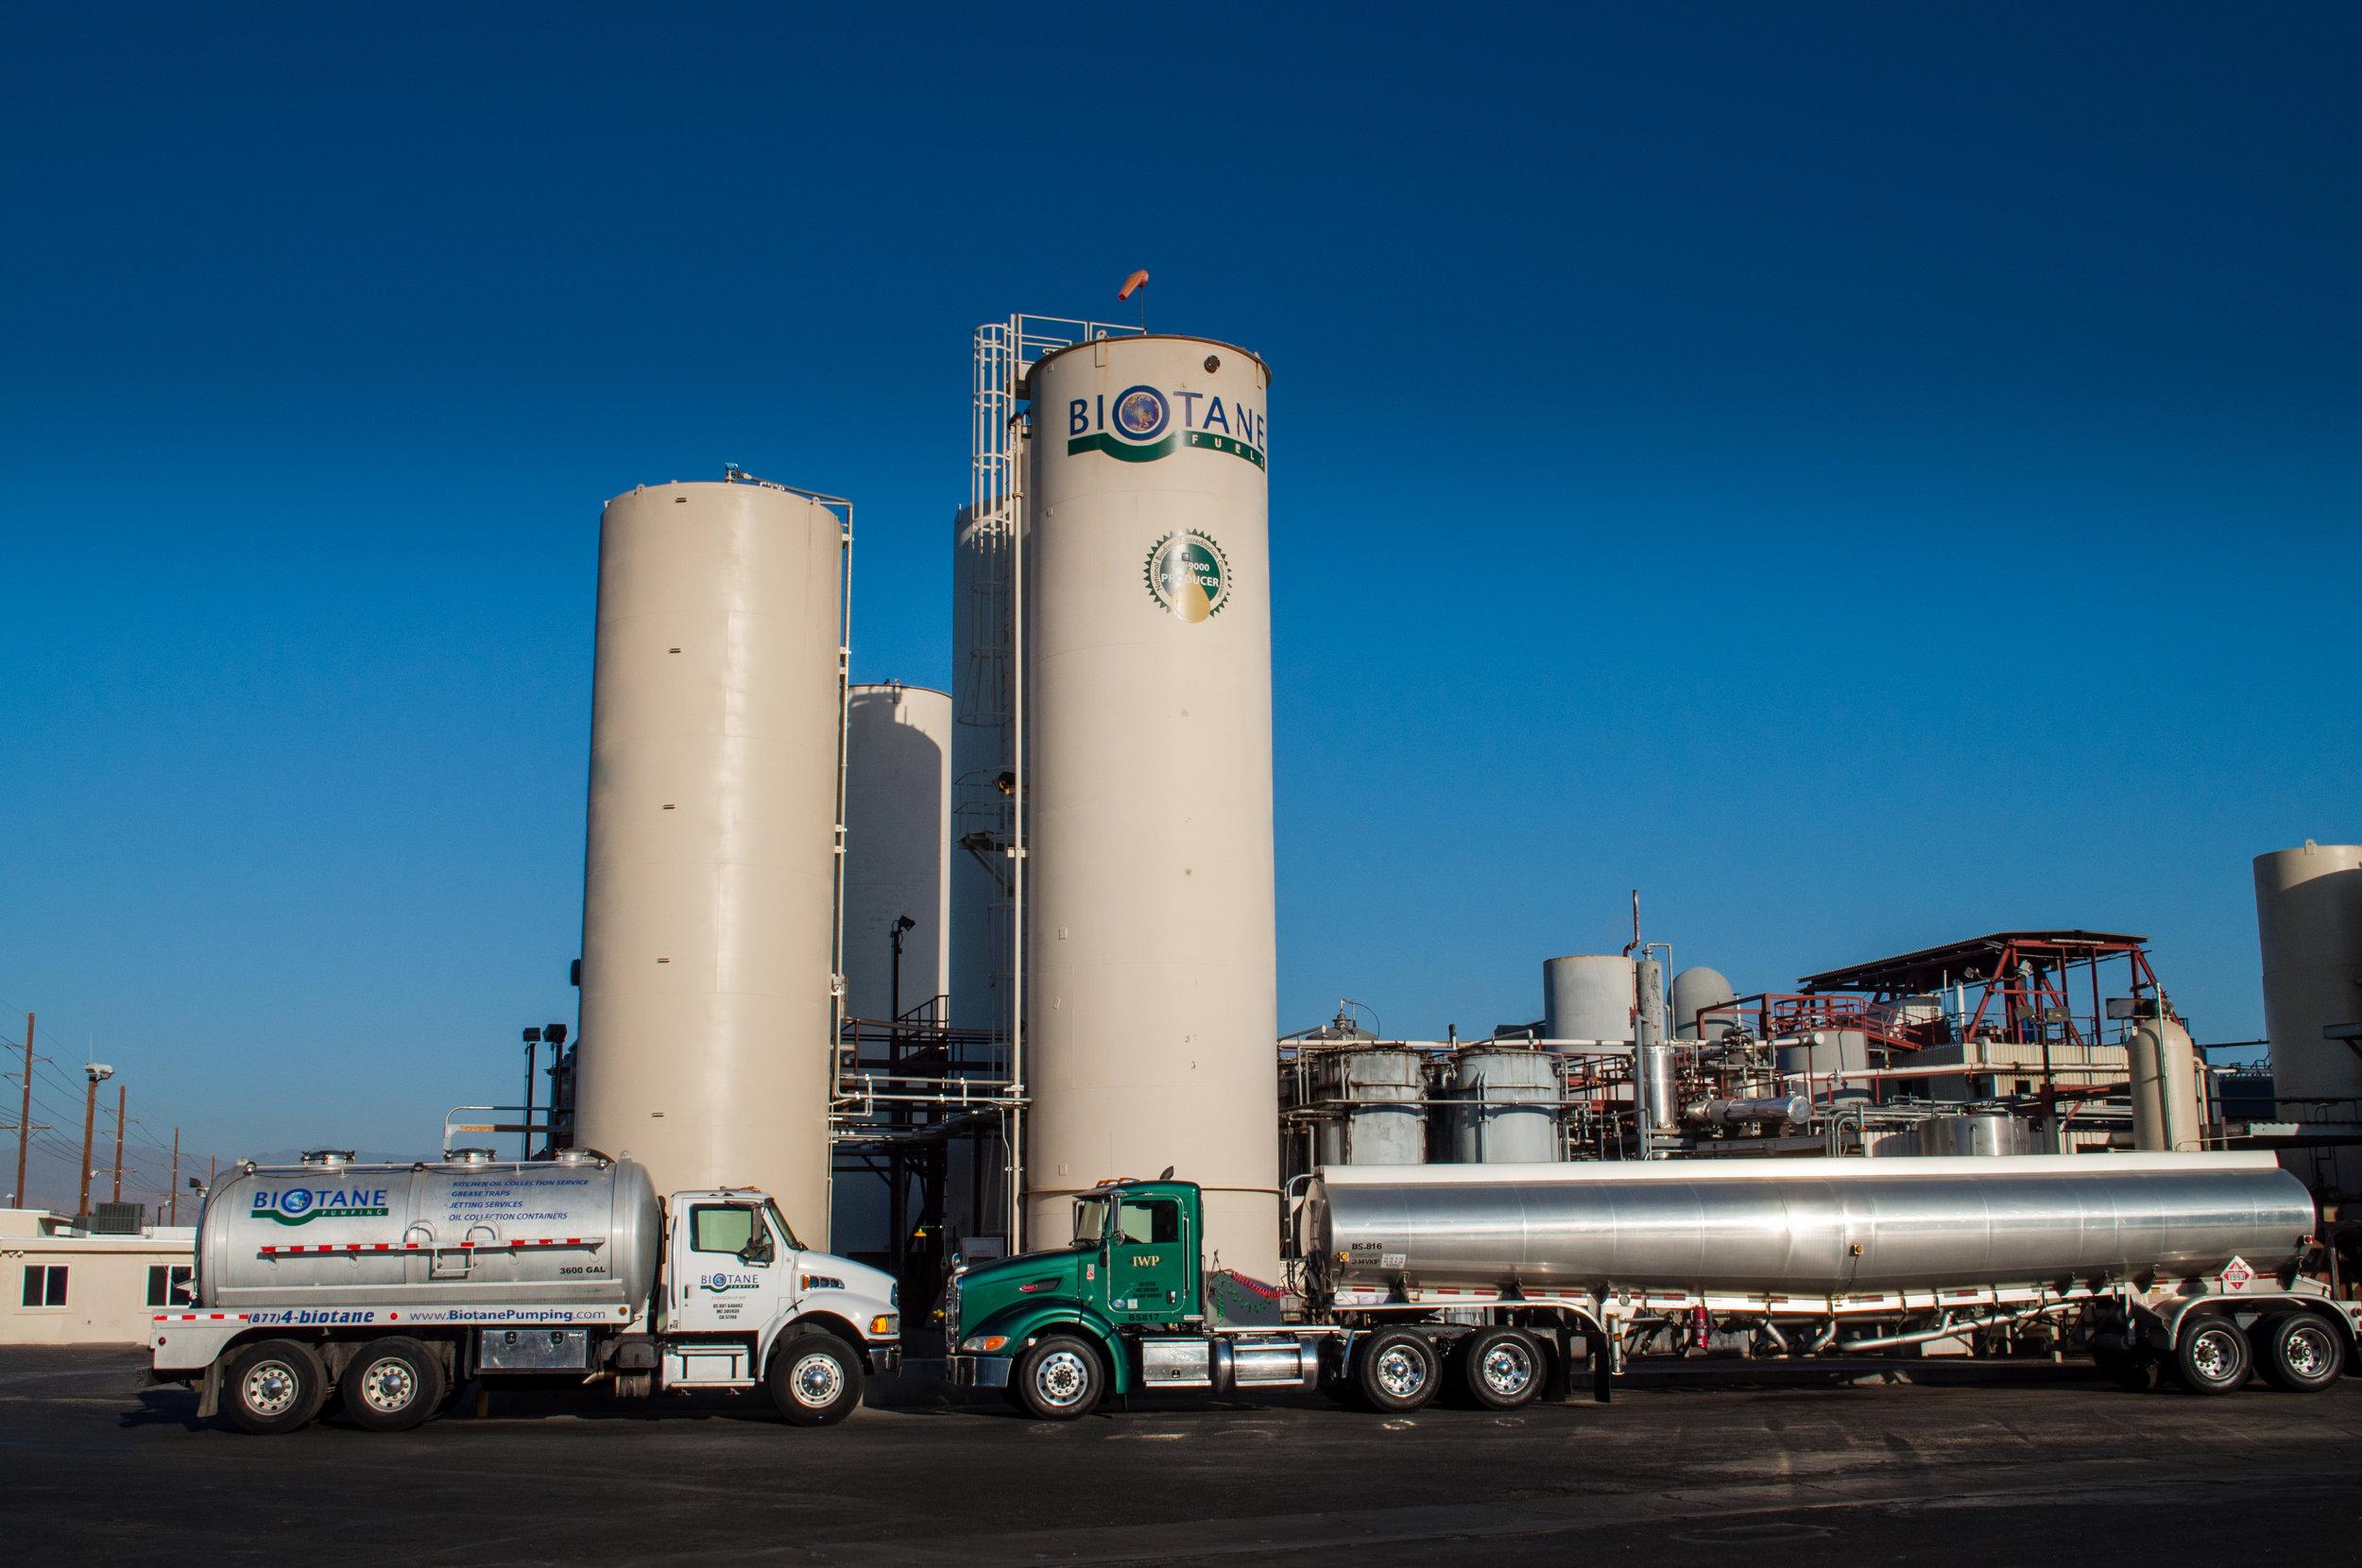 organic solutions palm springs waste Biotane Fuels